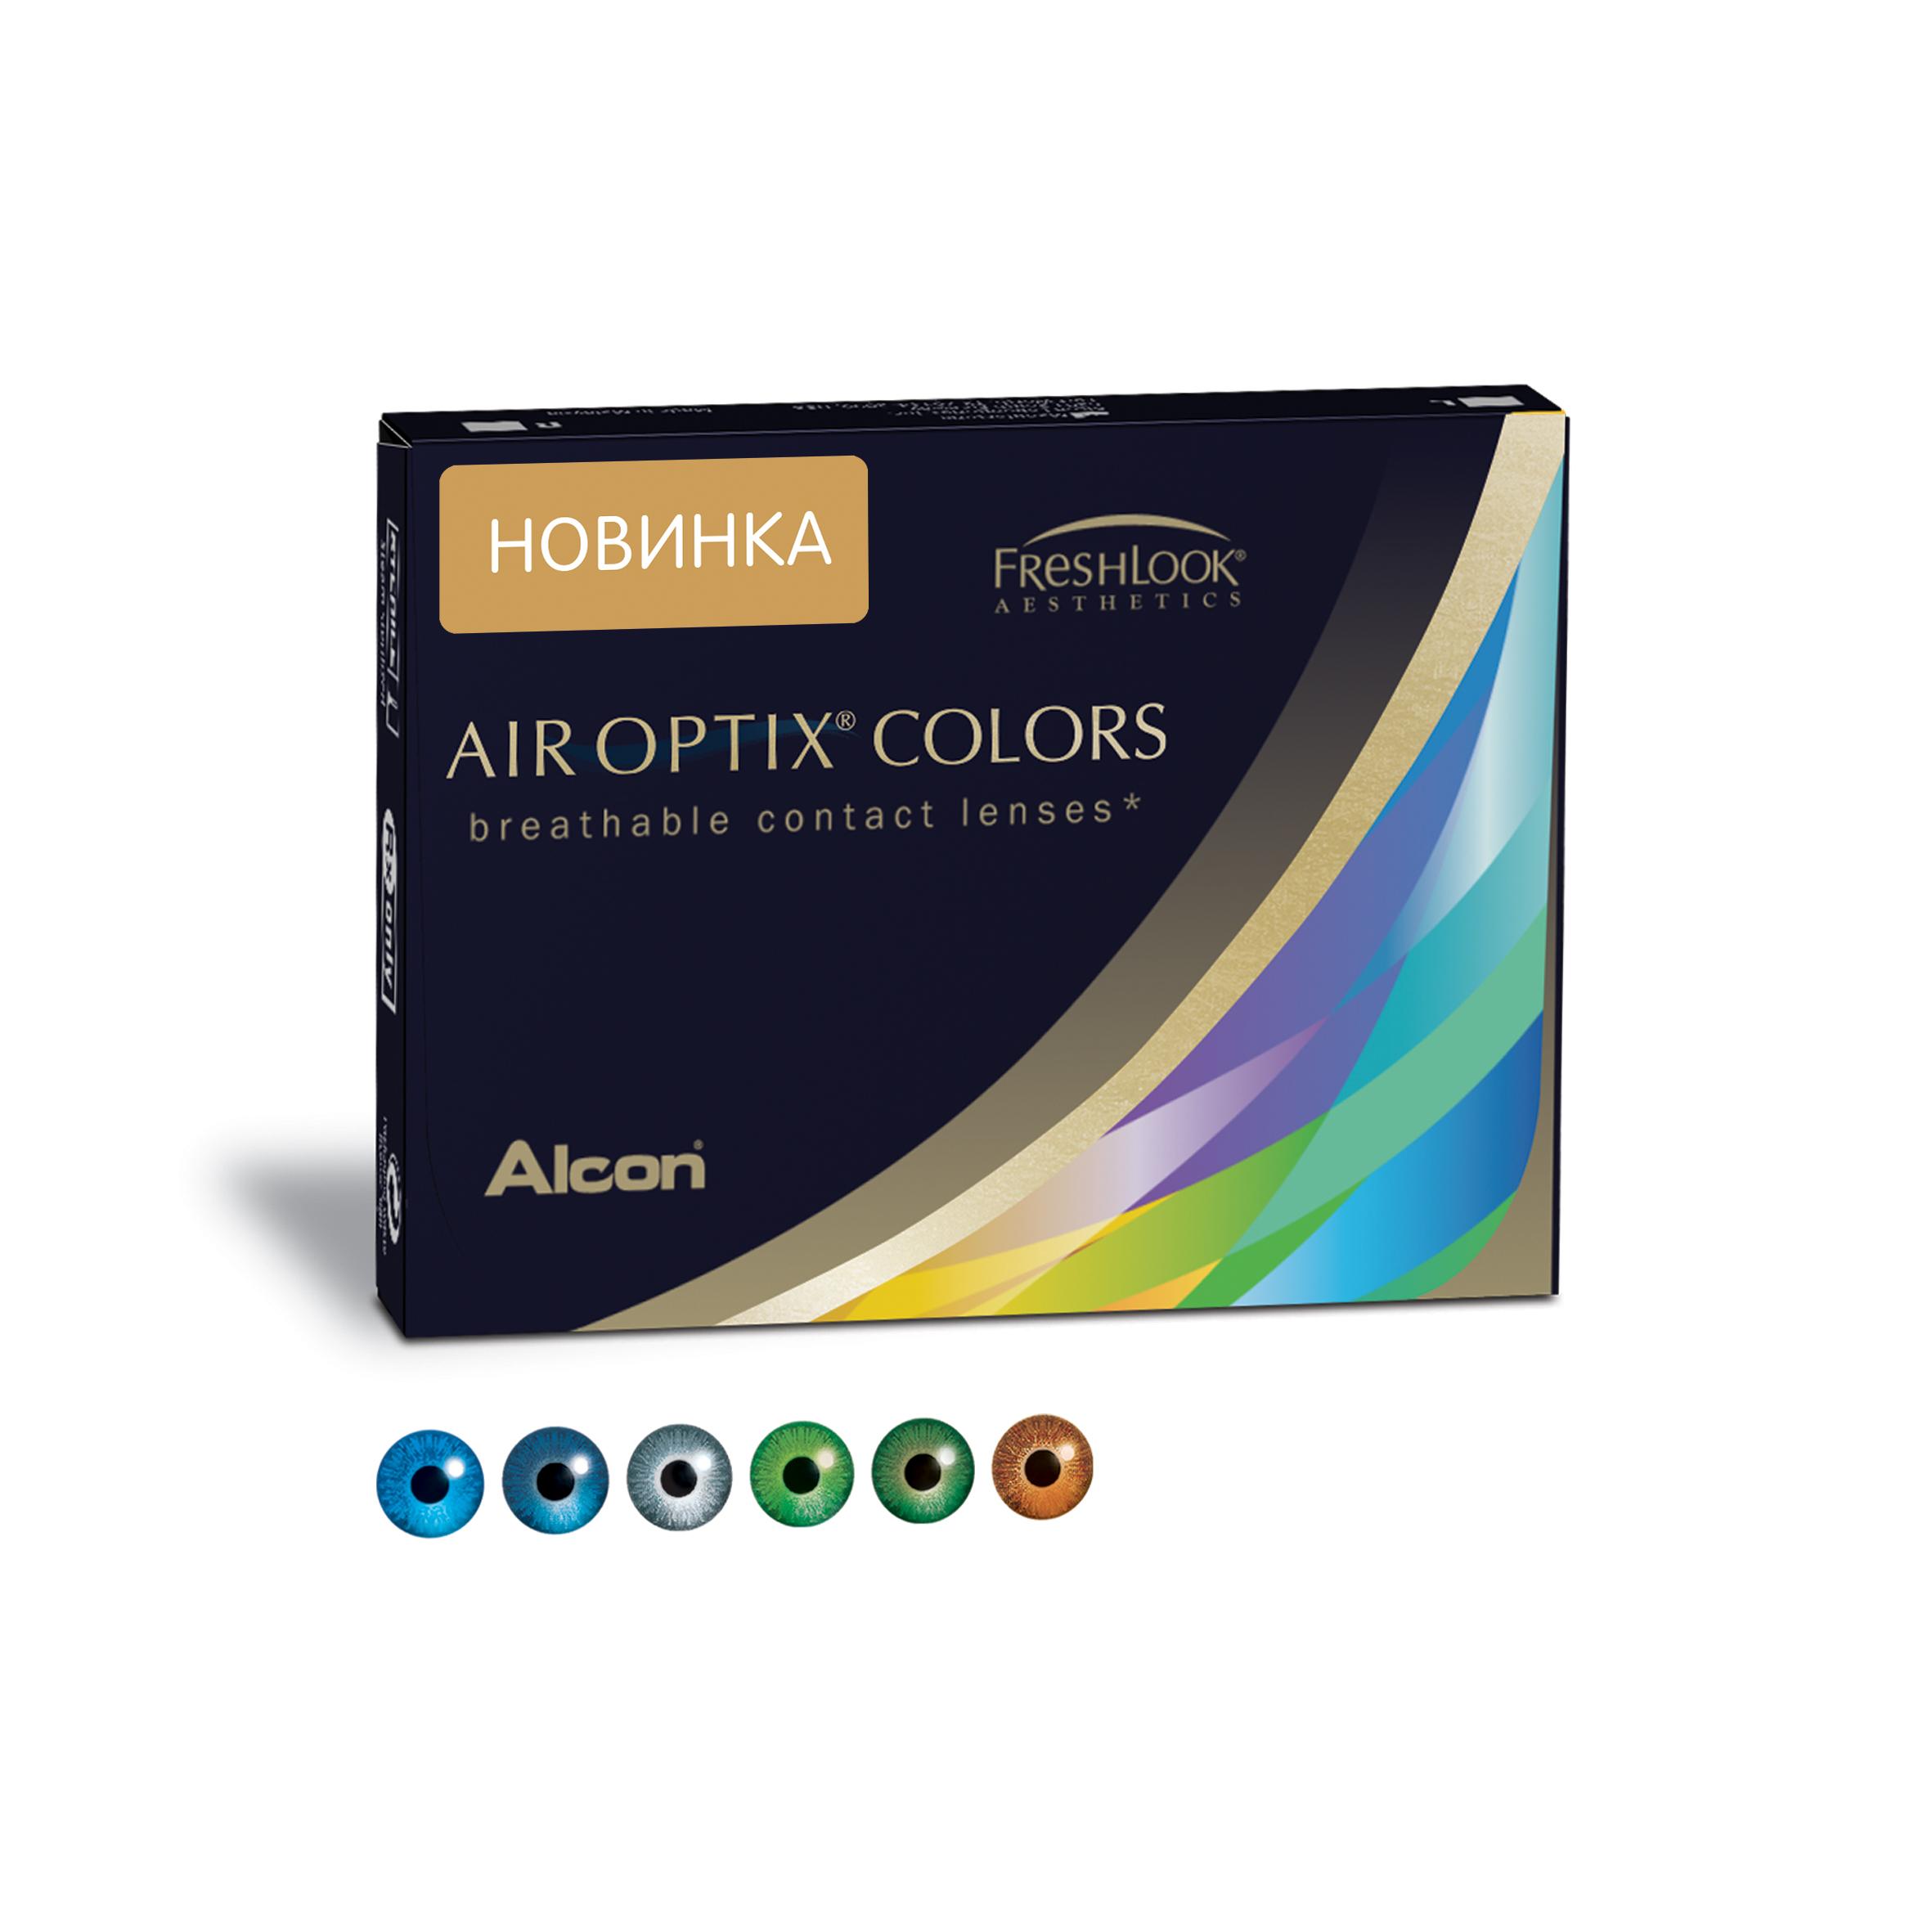 Аlcon контактные линзы Air Optix Colors 2 шт -4.75 Green31746261Мягкие контактные линзы